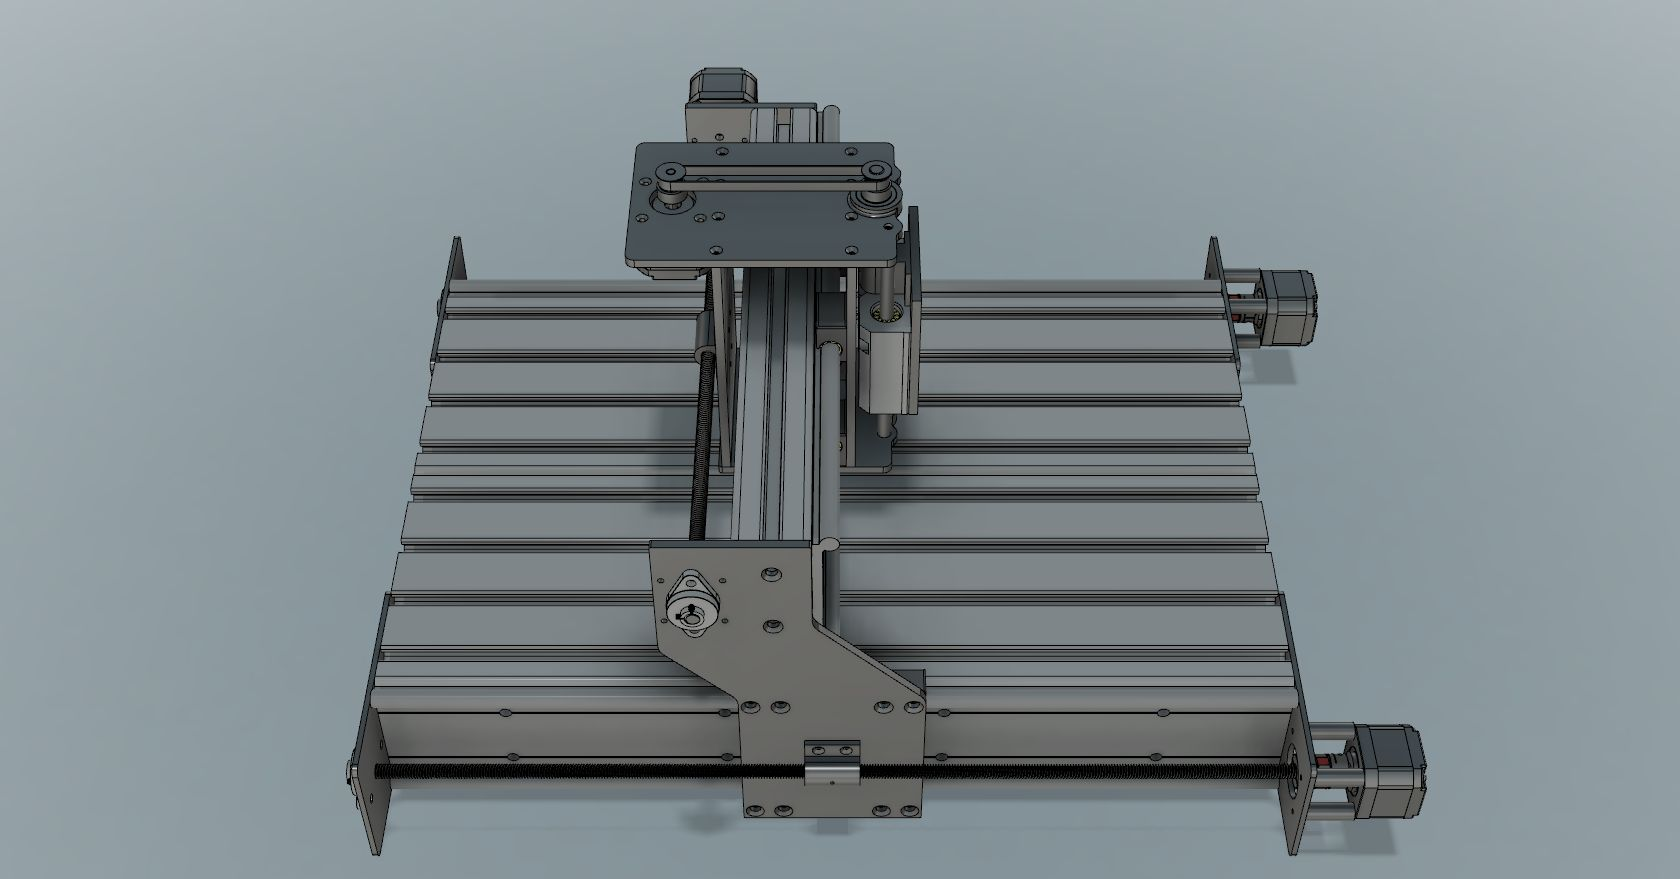 Fresadora-320x500-2-3500-3500